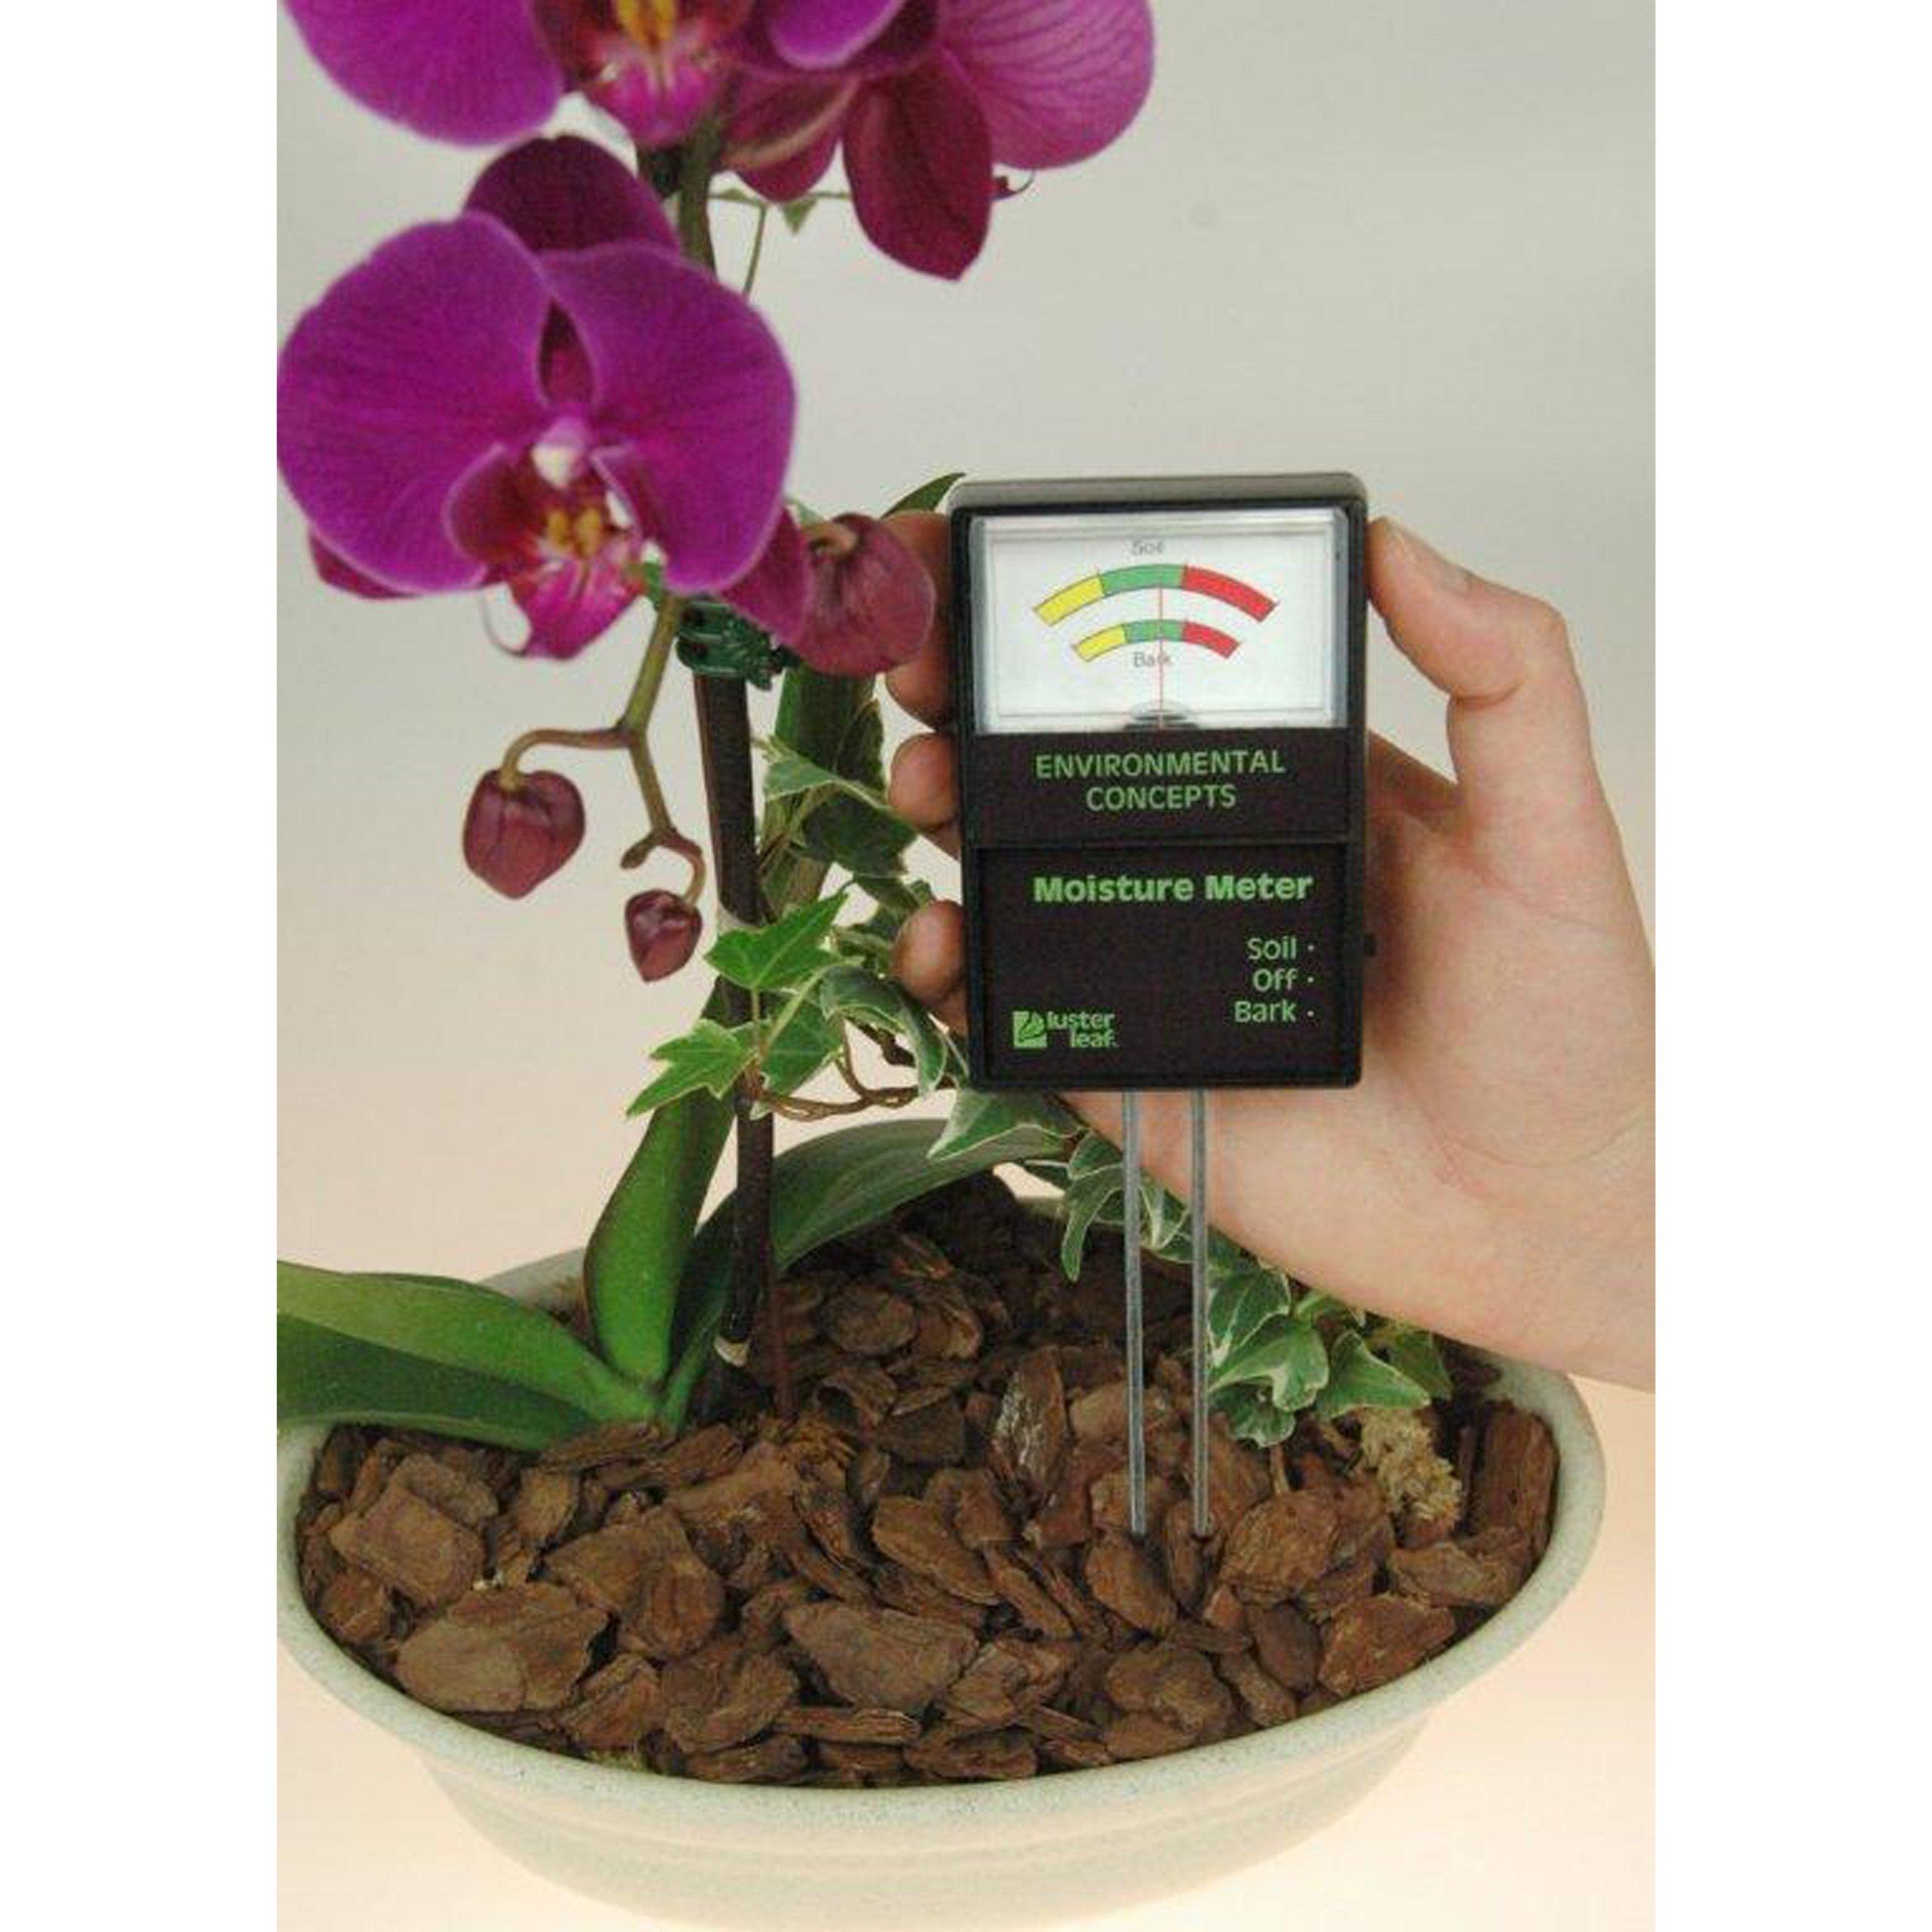 Environmental Concepts SBM12 Soil and Bark Moisture Meter by Environmental Concepts (Image #2)